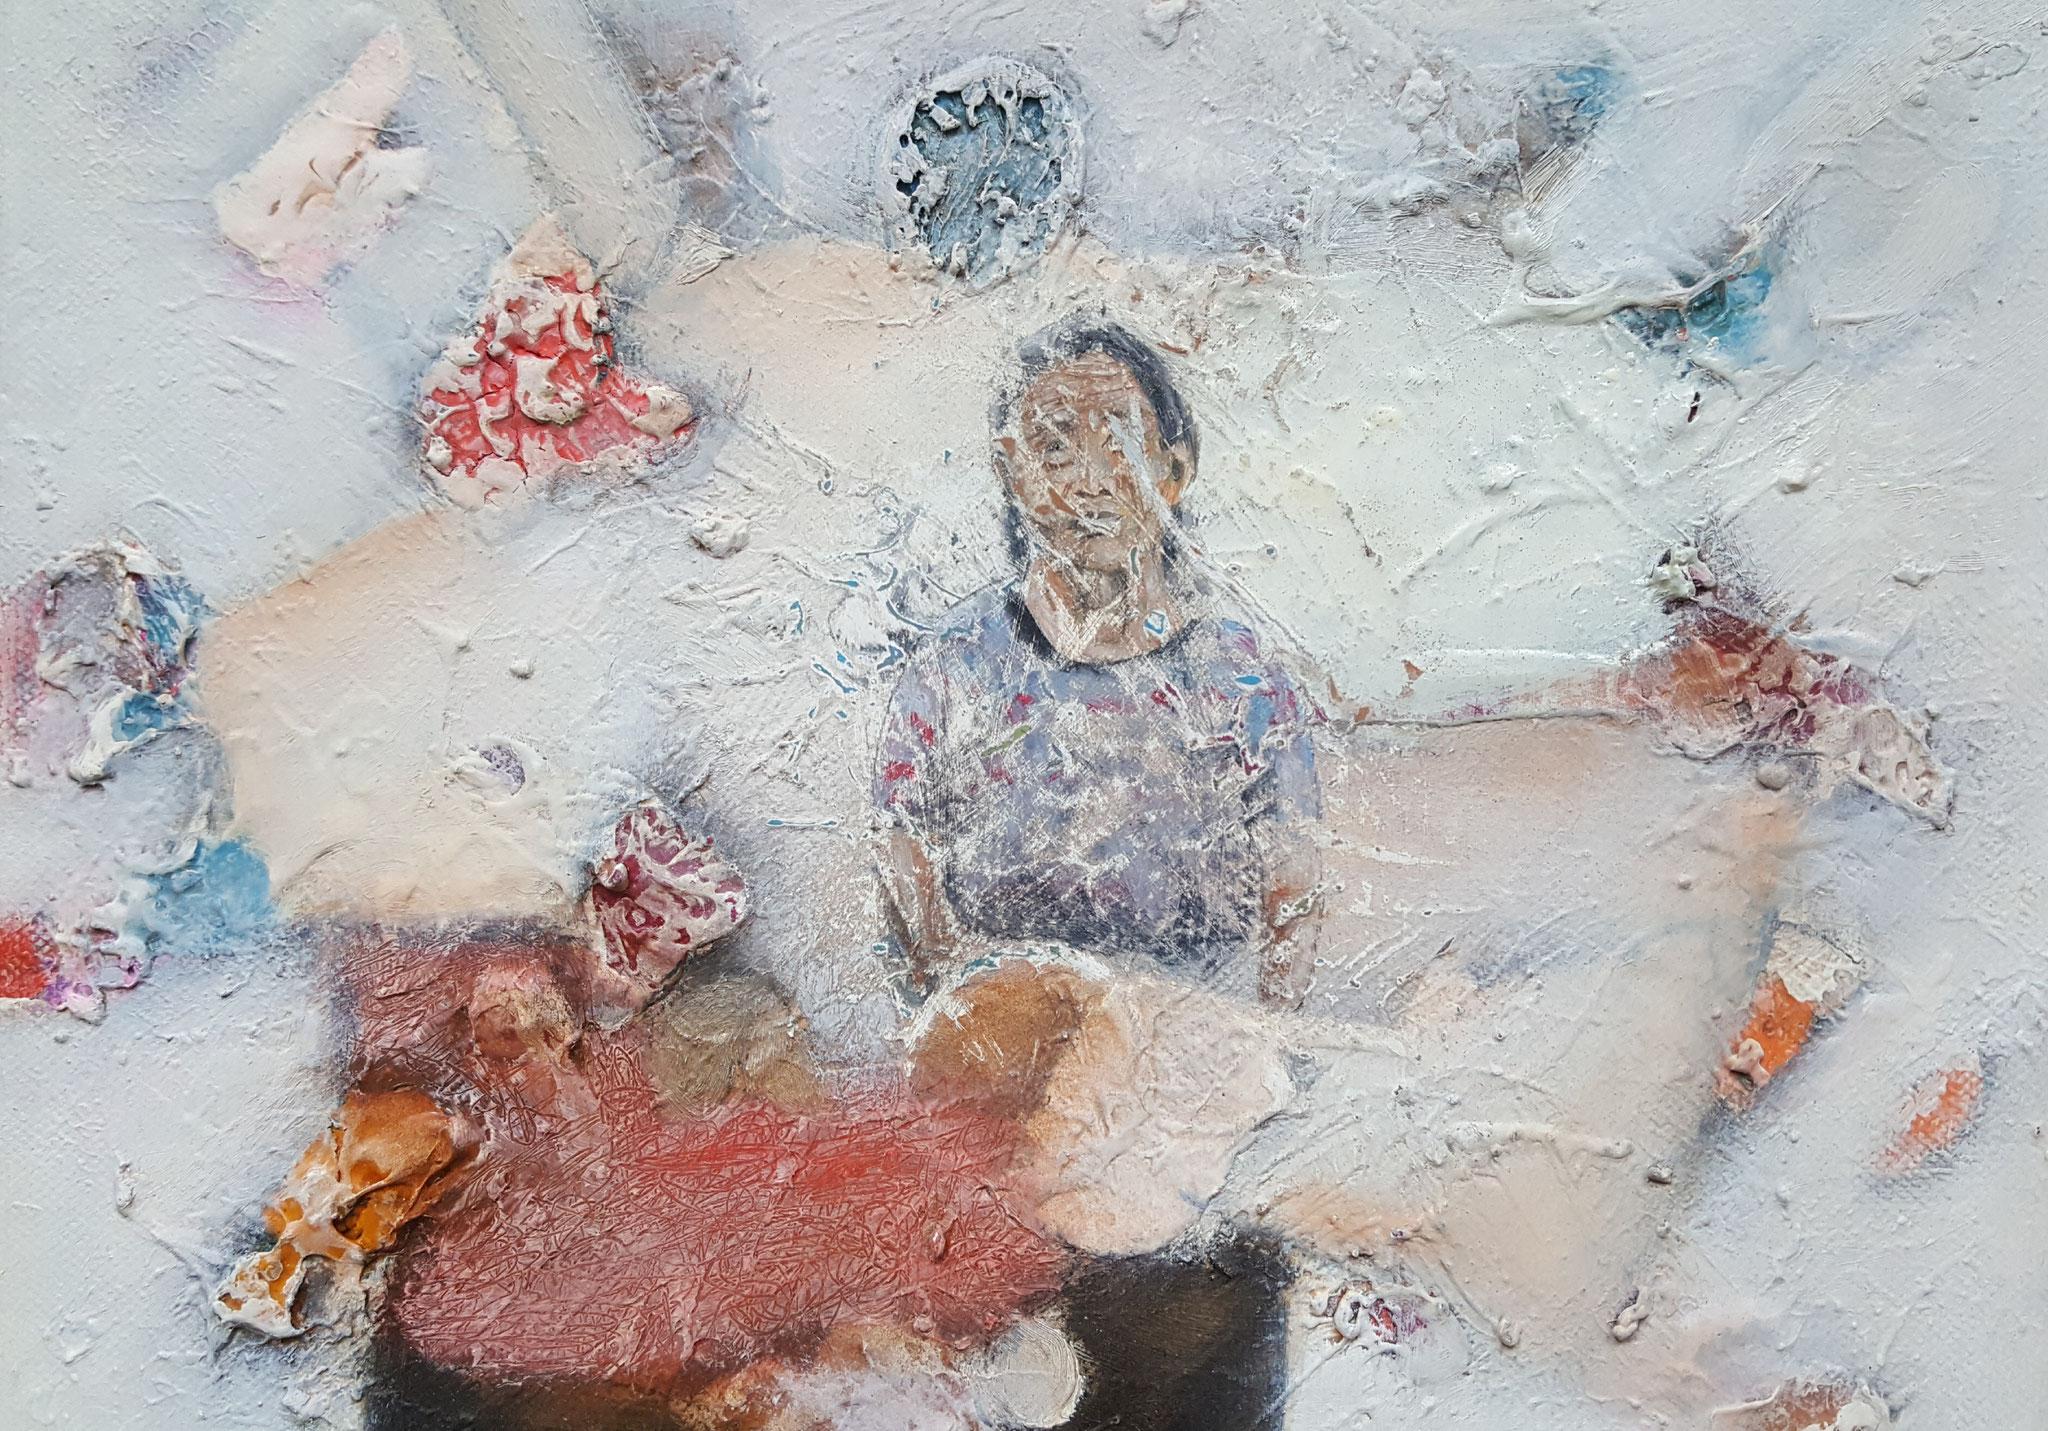 Des-aparecidos III, 2018, 30 x 24 cm, Mixed media on canvas